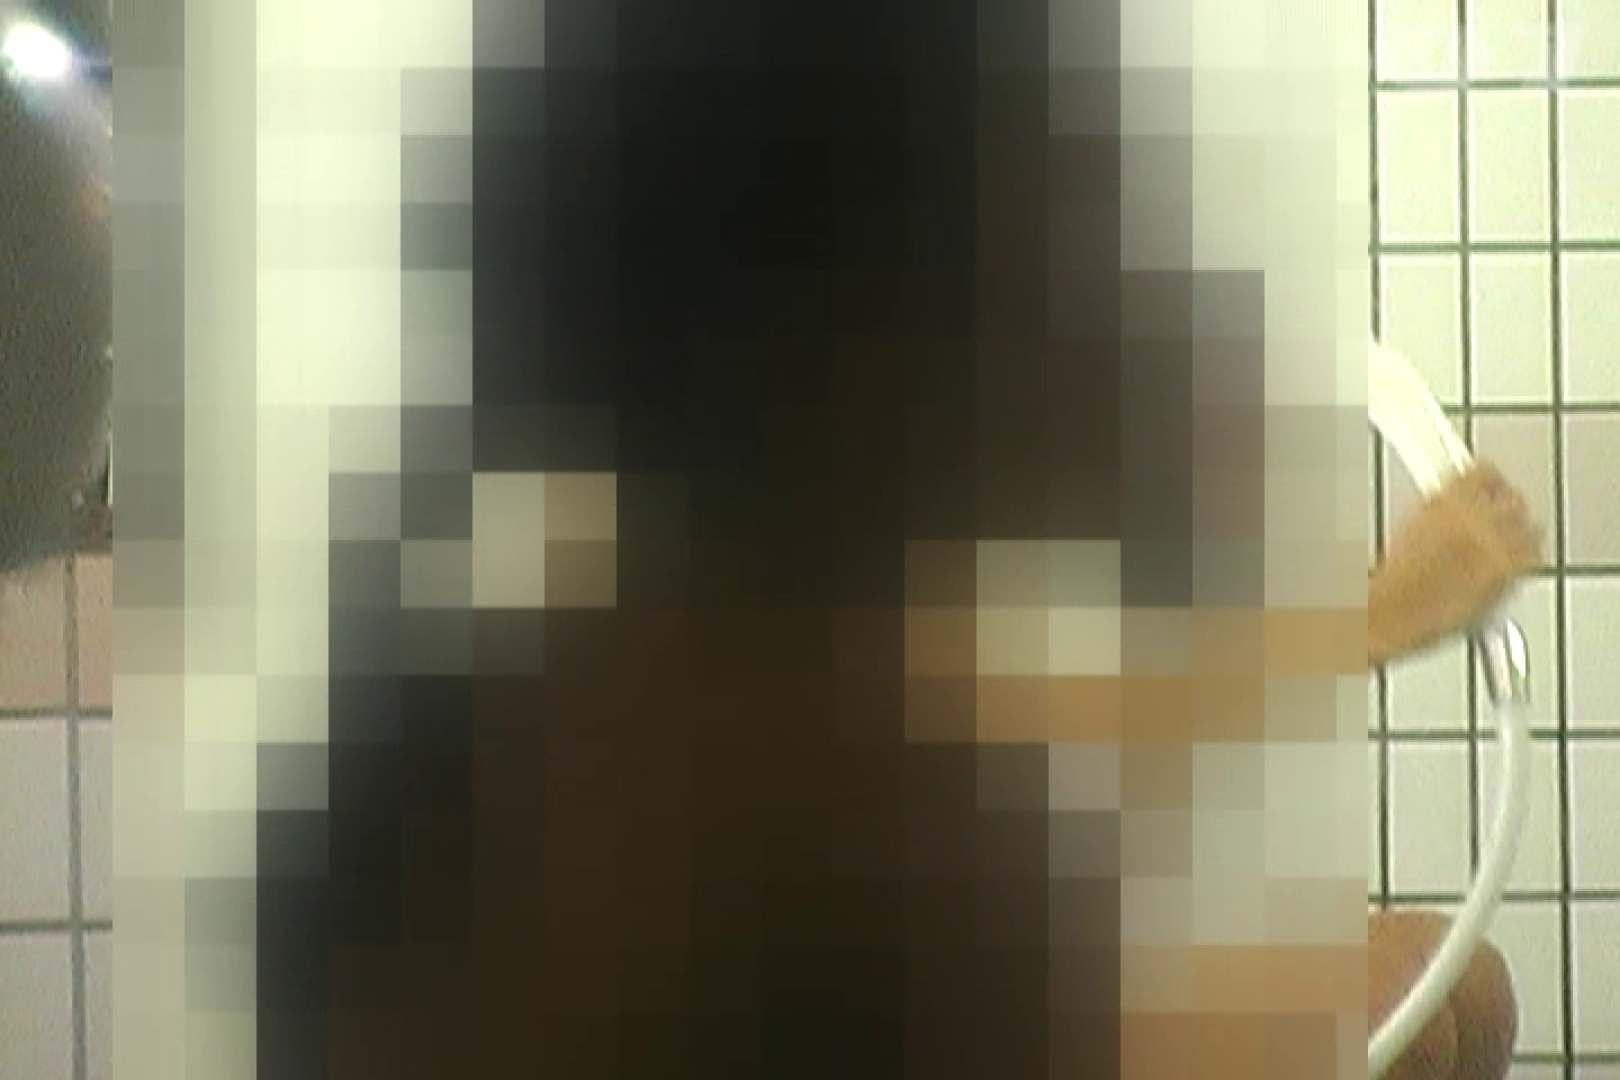 ▲復活限定▲合宿ホテル女風呂盗撮 Vol.07 0 | 0  92画像 61